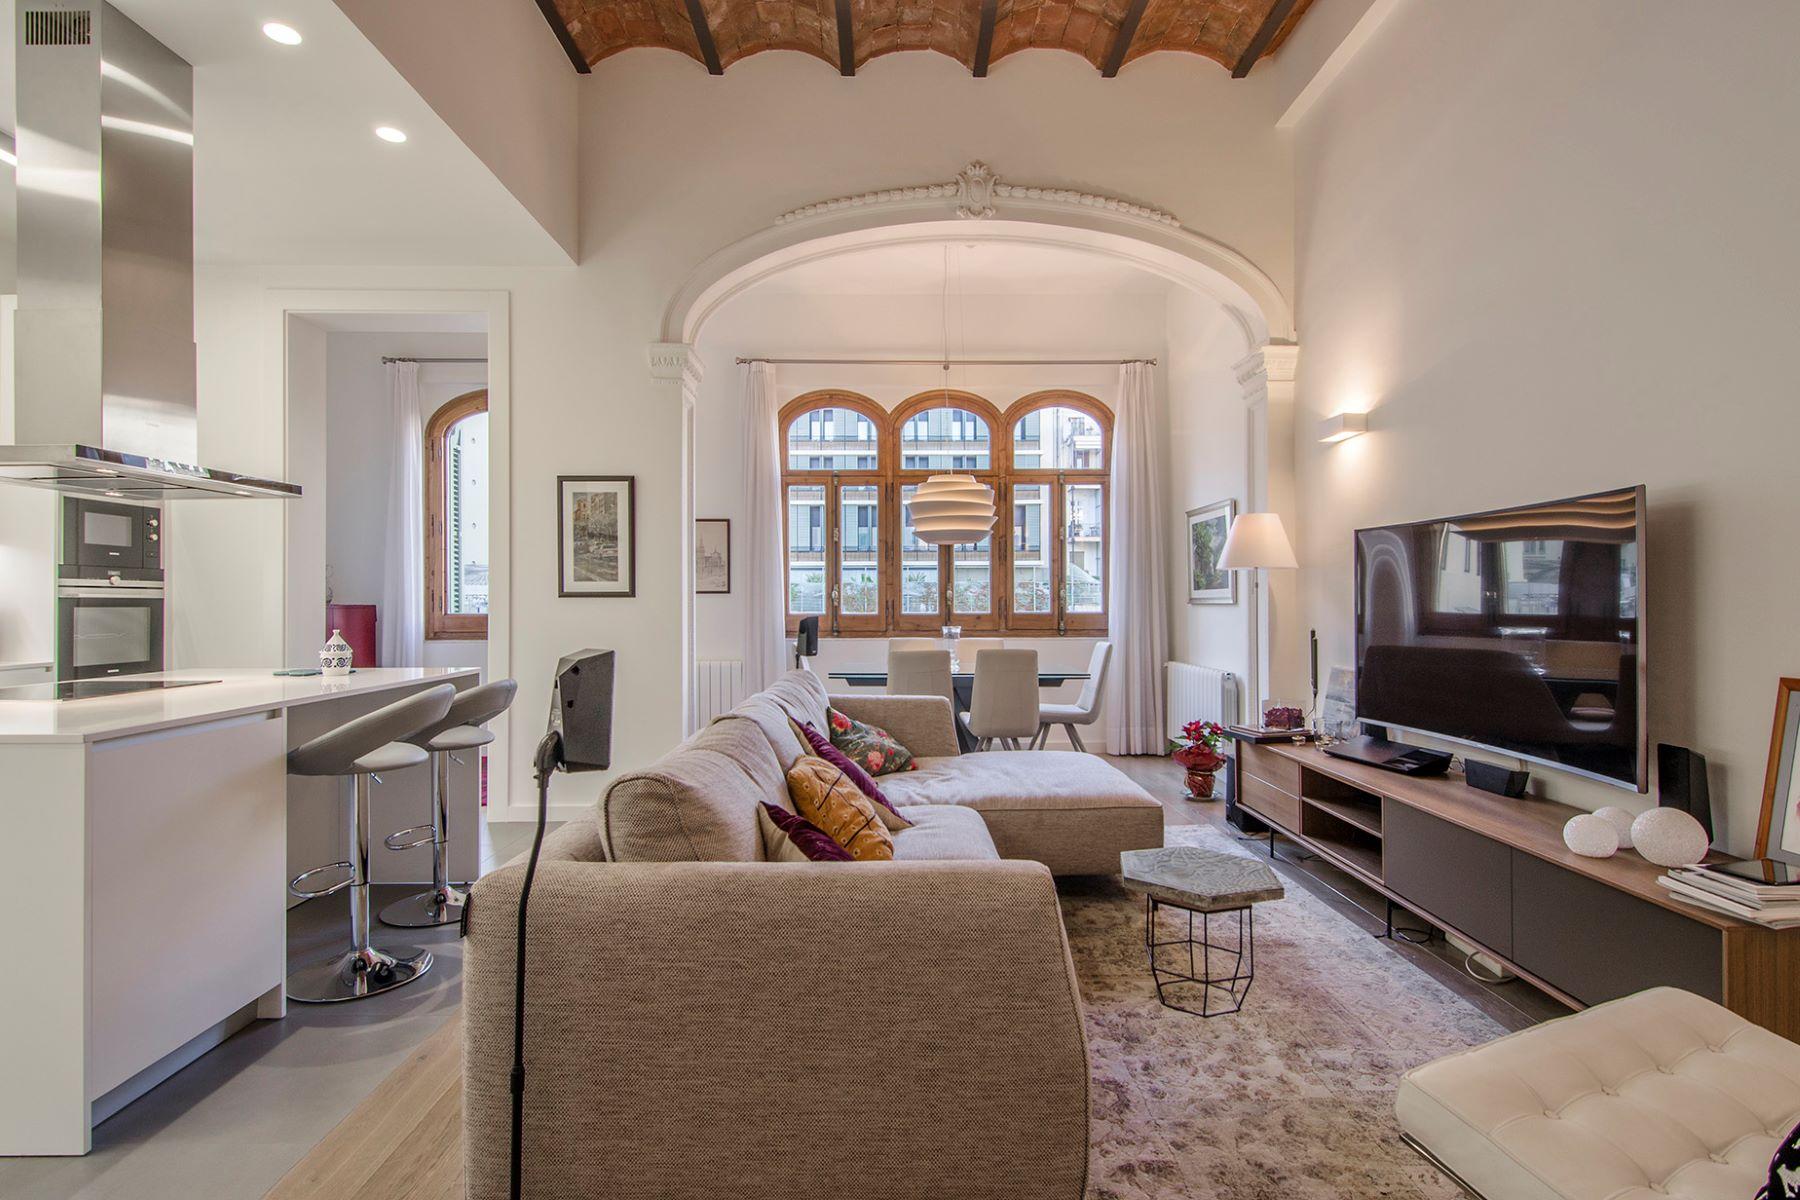 Wohnung für Verkauf beim Fantastic Apartment Near the Paseo de Gracia Barcelona City, Barcelona, 08007 Spanien